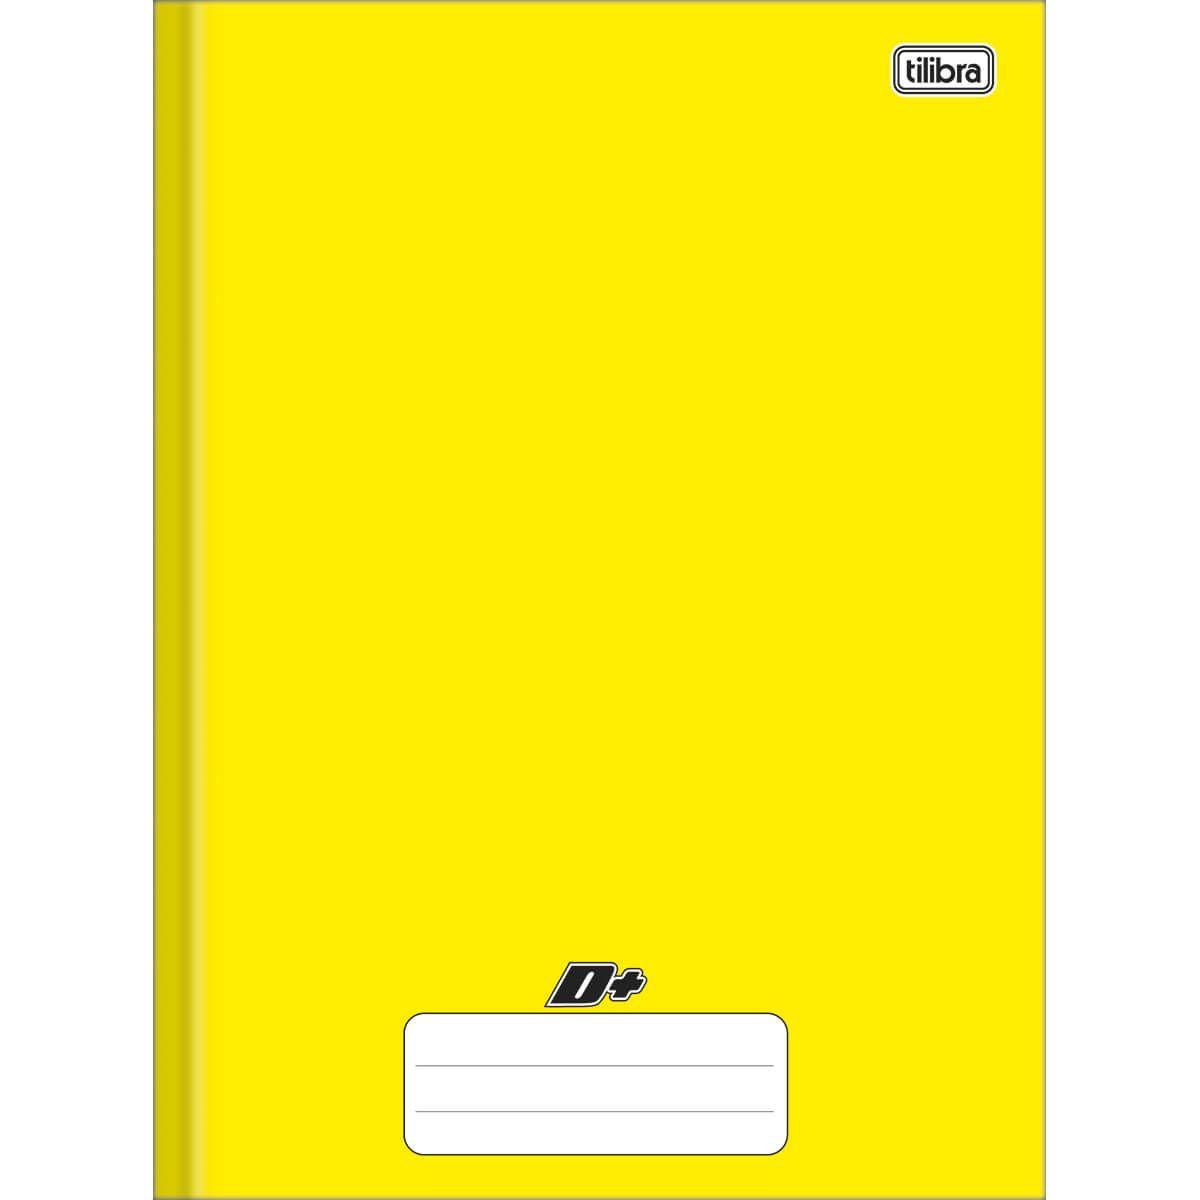 Caderno brochura 48 fls amarelo D+ Tilibra